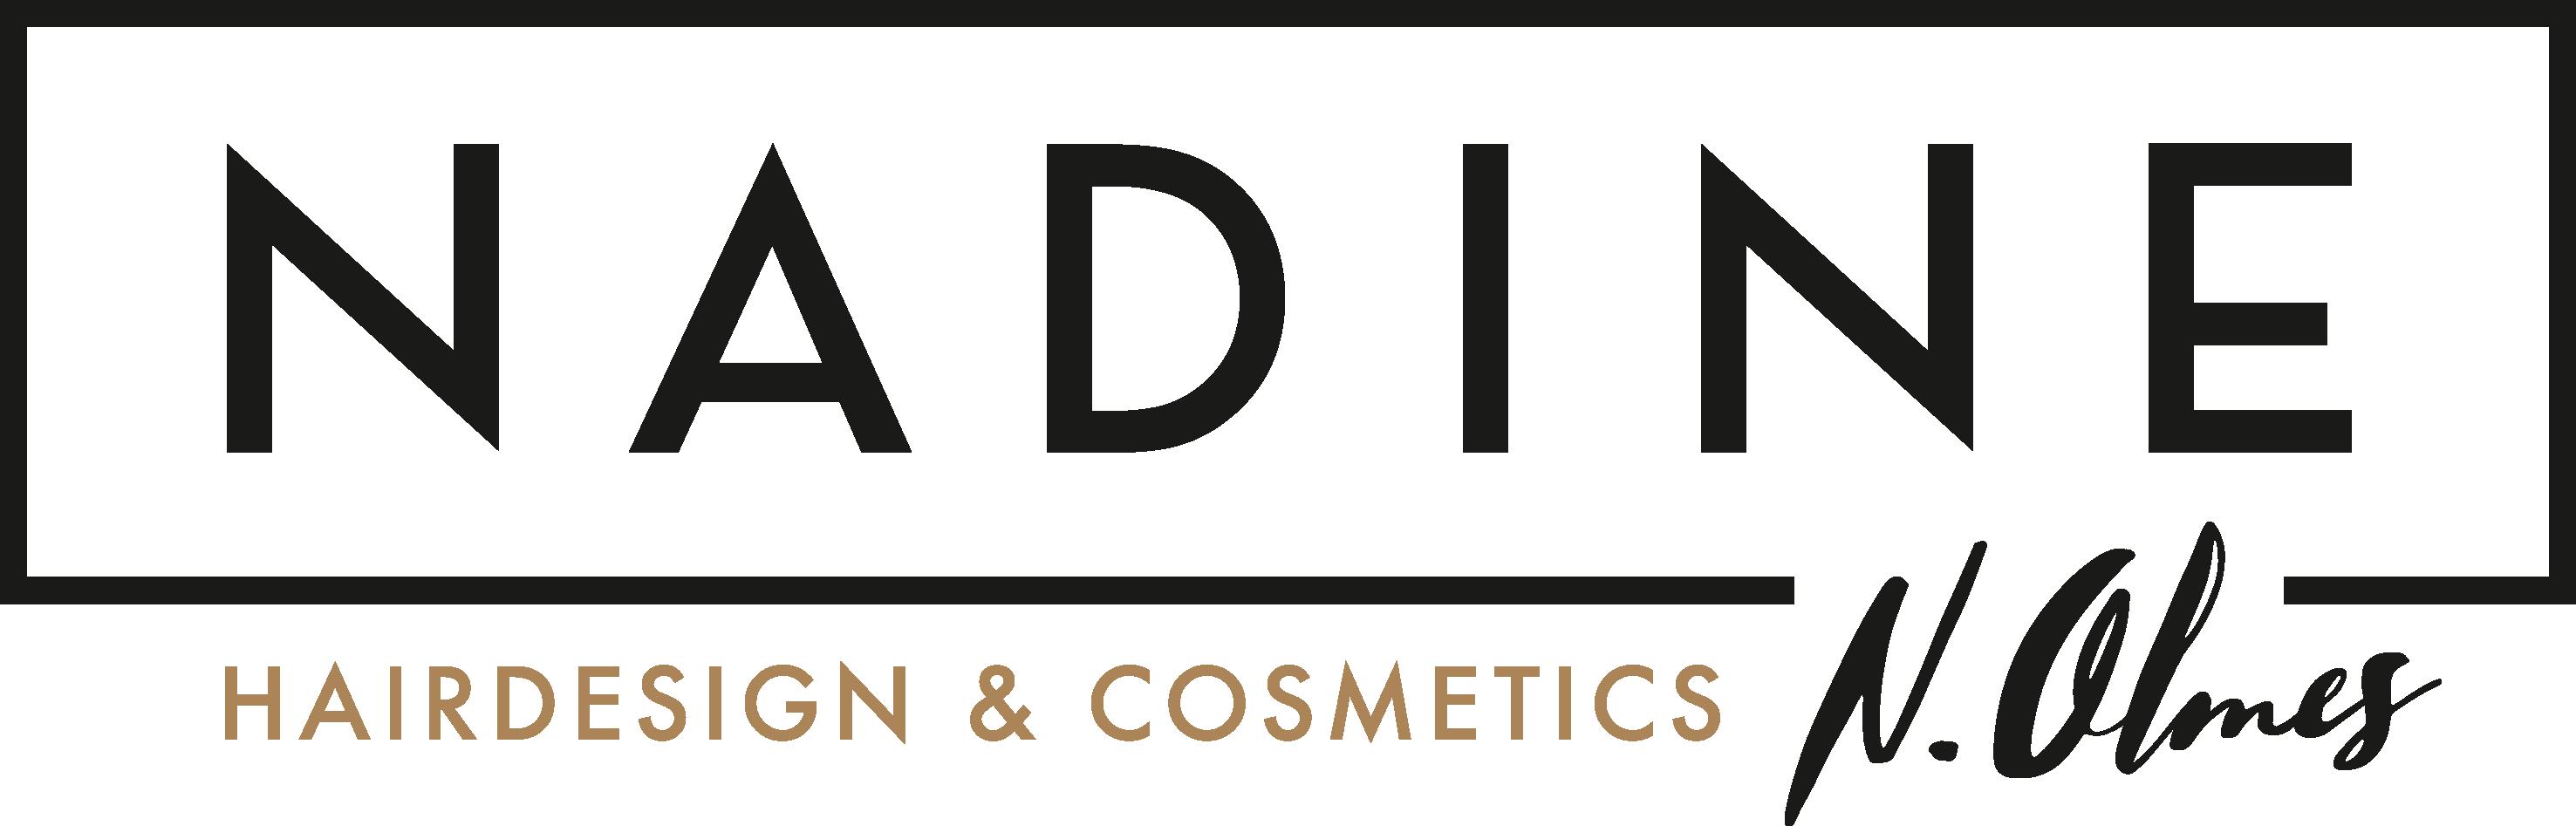 Nadine Hairdesign & Cosmetics Ense - Logo